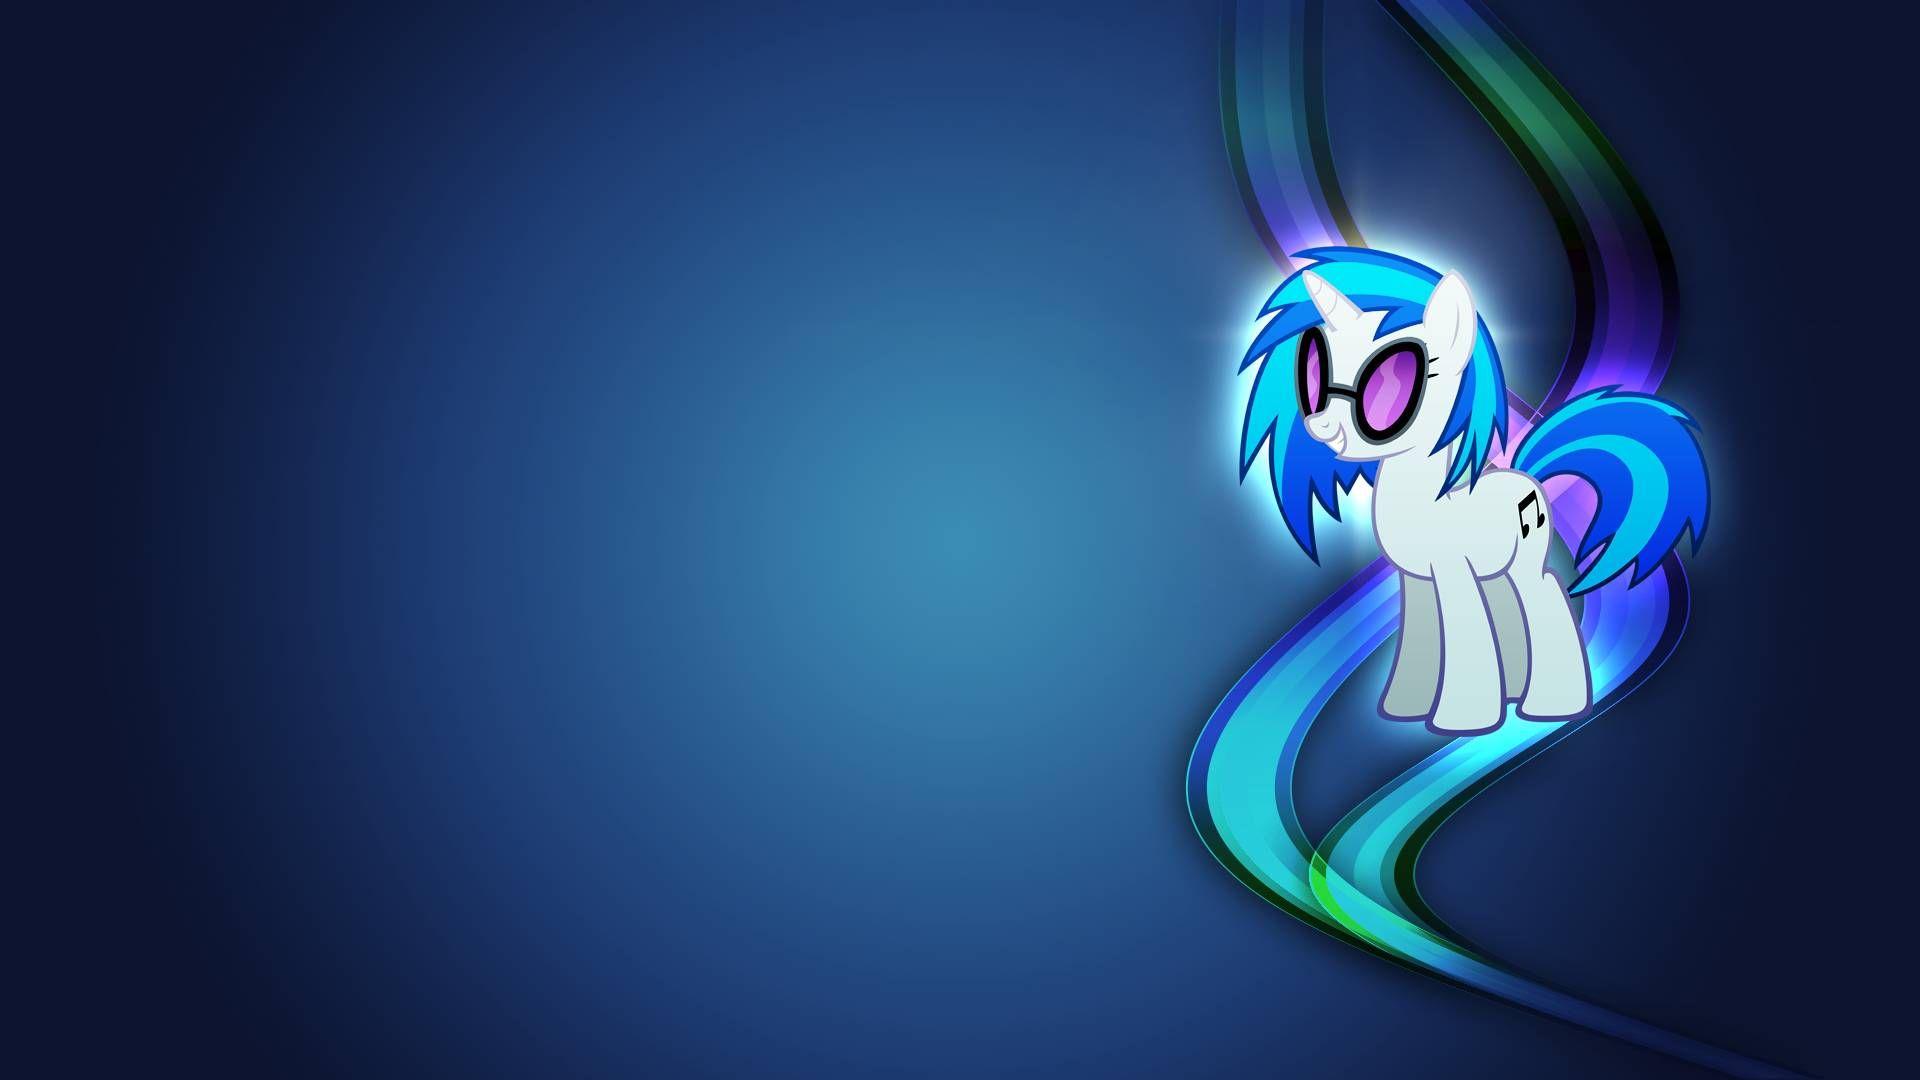 Dj Pon3 My Little Pony Friendship Is Magic Wallpaper My Little Pony Friendship My Little Pony Pony